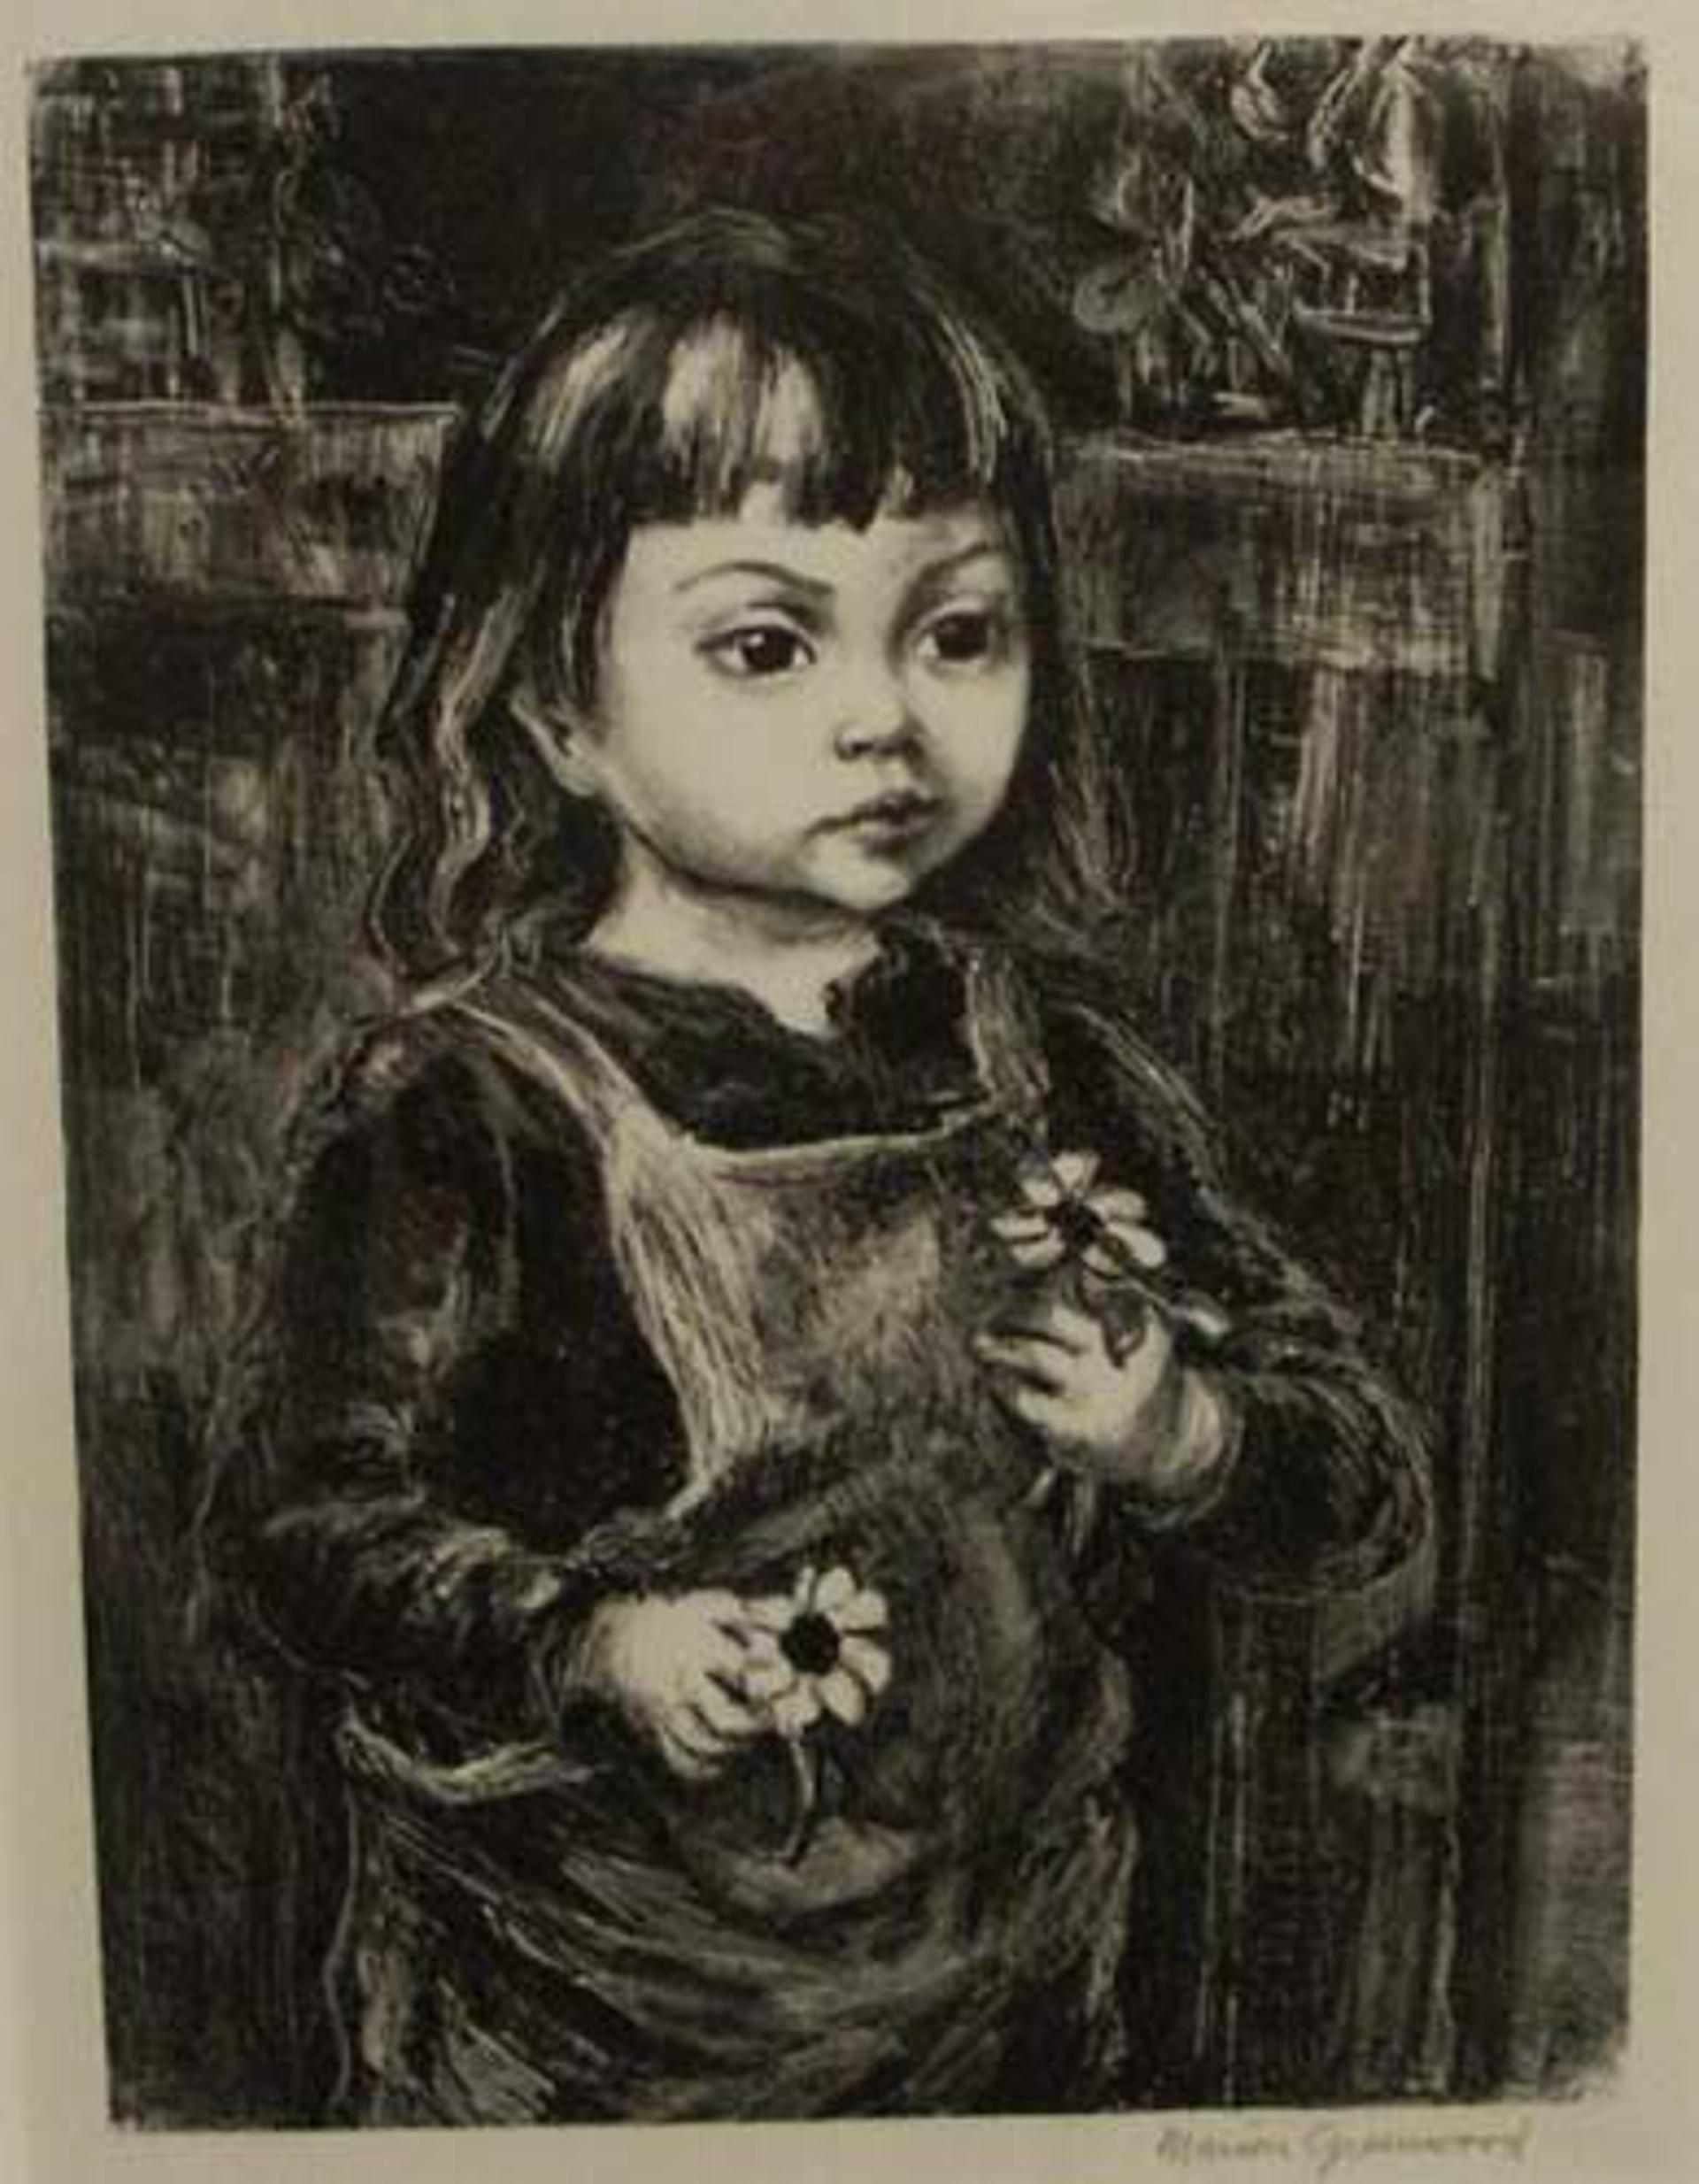 Black Eyed Susan by Marion Greenwood